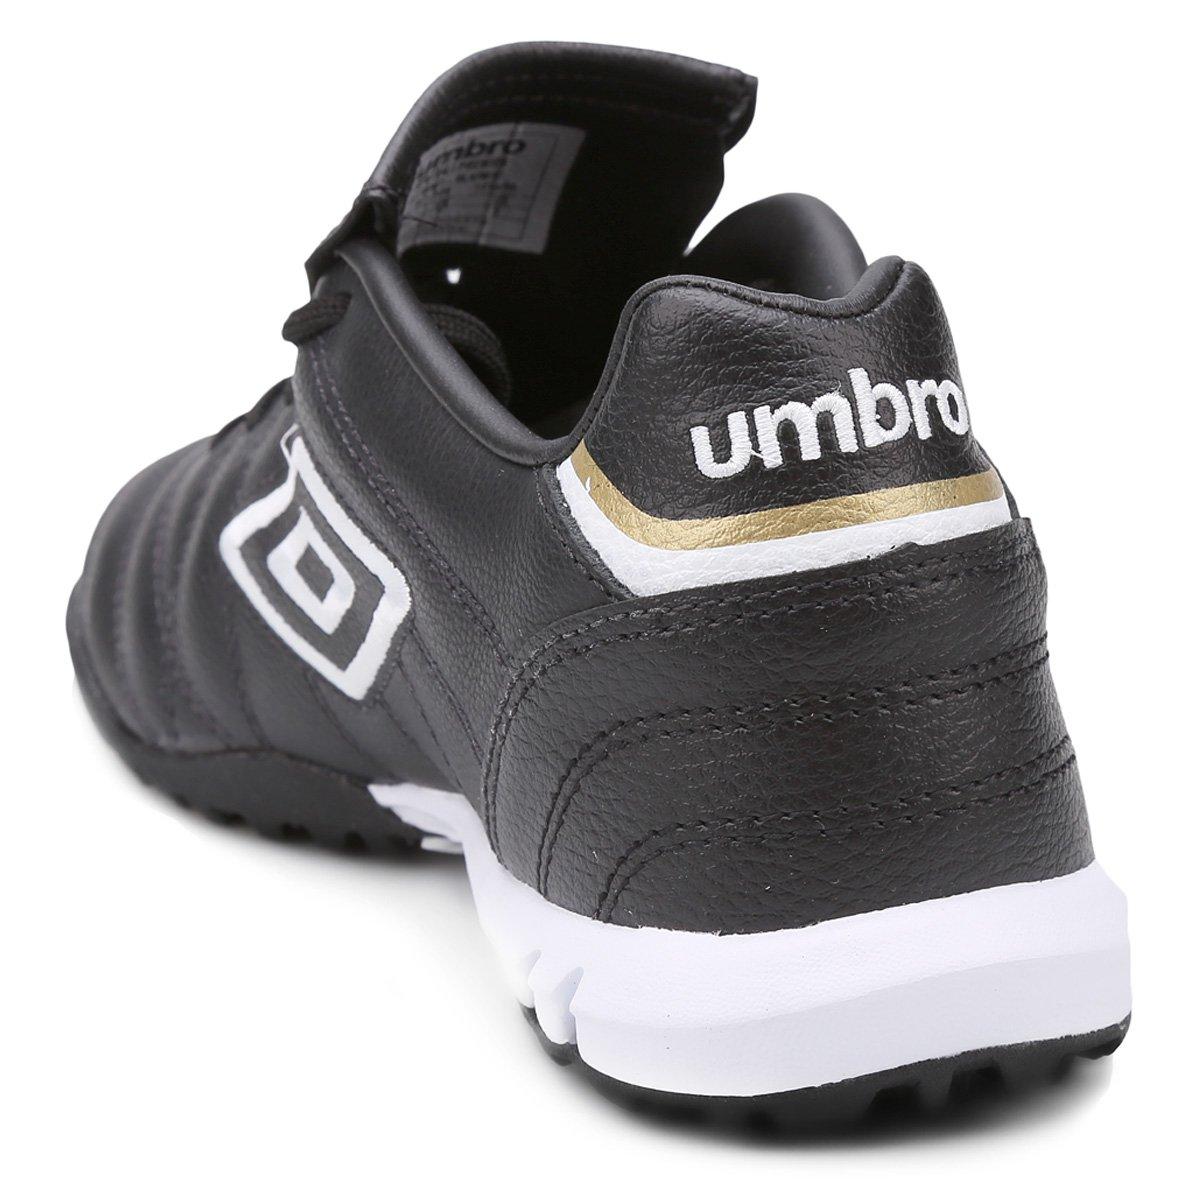 Chuteira Society Umbro Speciali Premier - Compre Agora  a4089b392e9ac